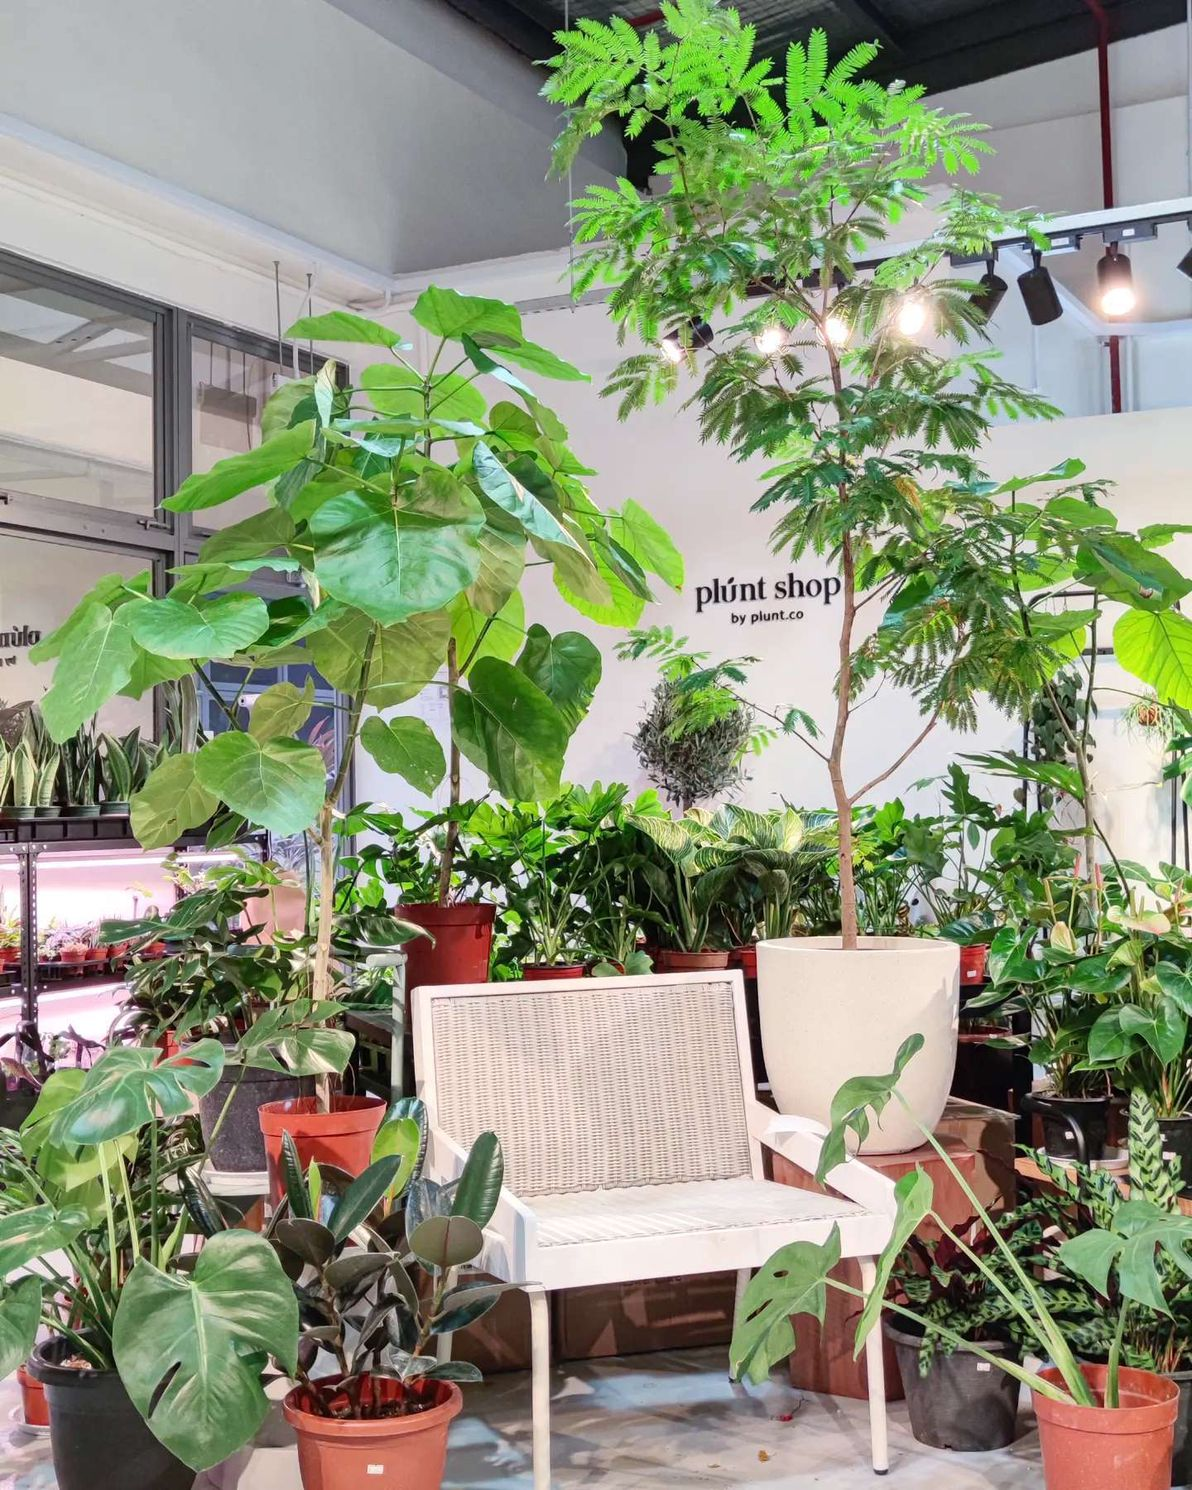 plunt shop singapore